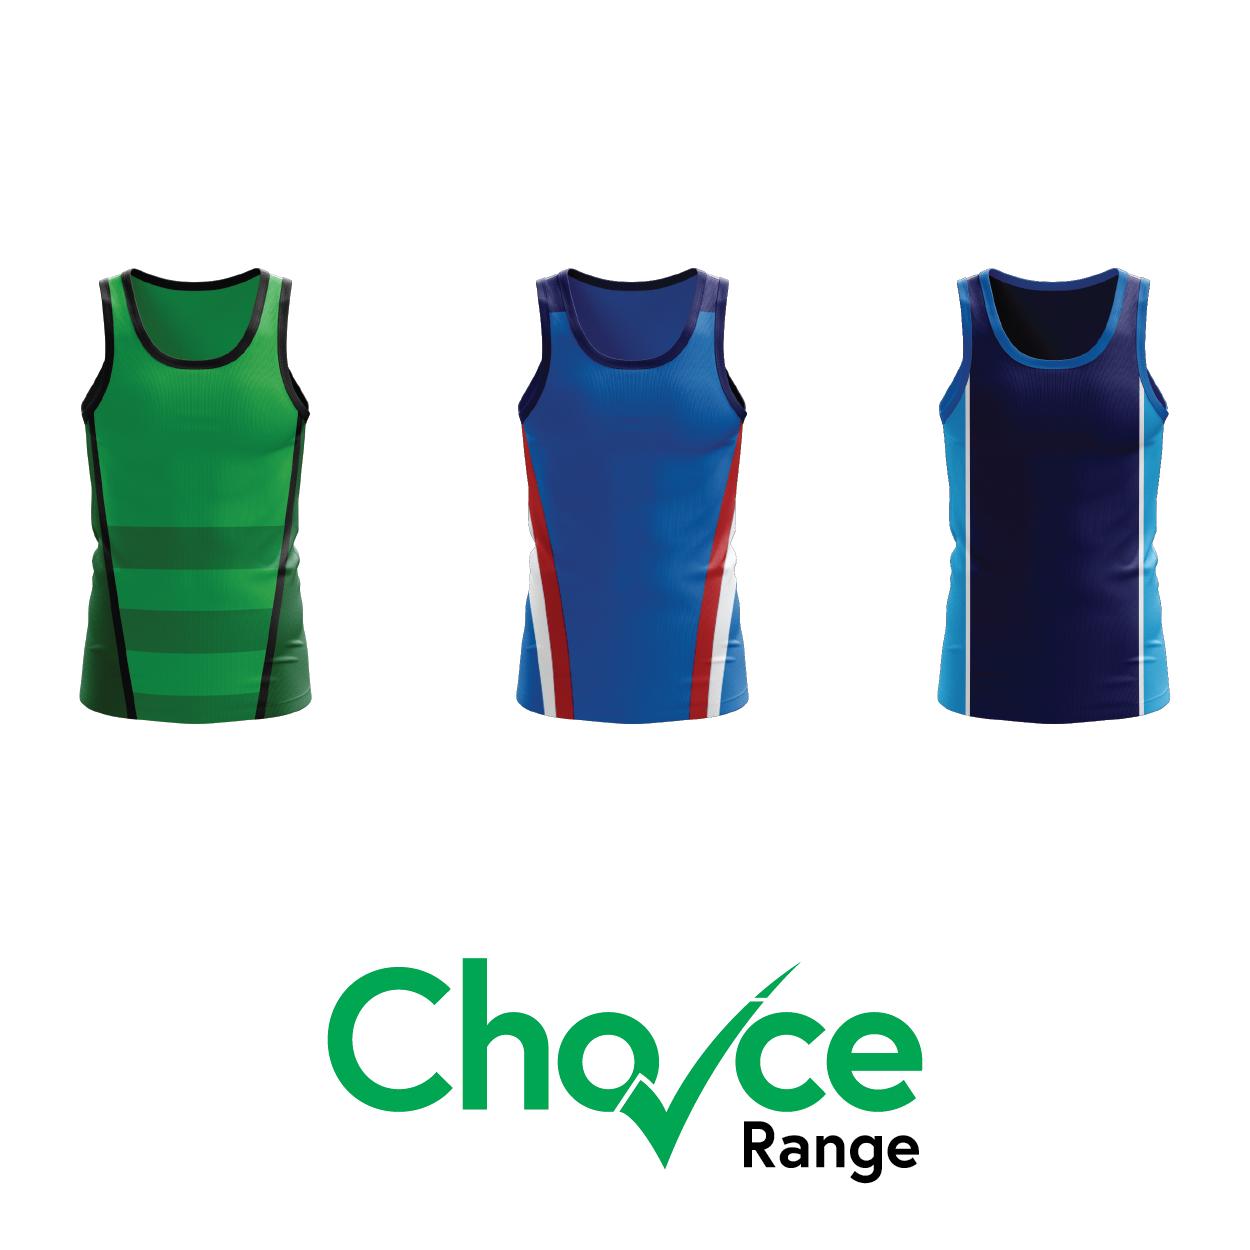 Choice Range Singlets